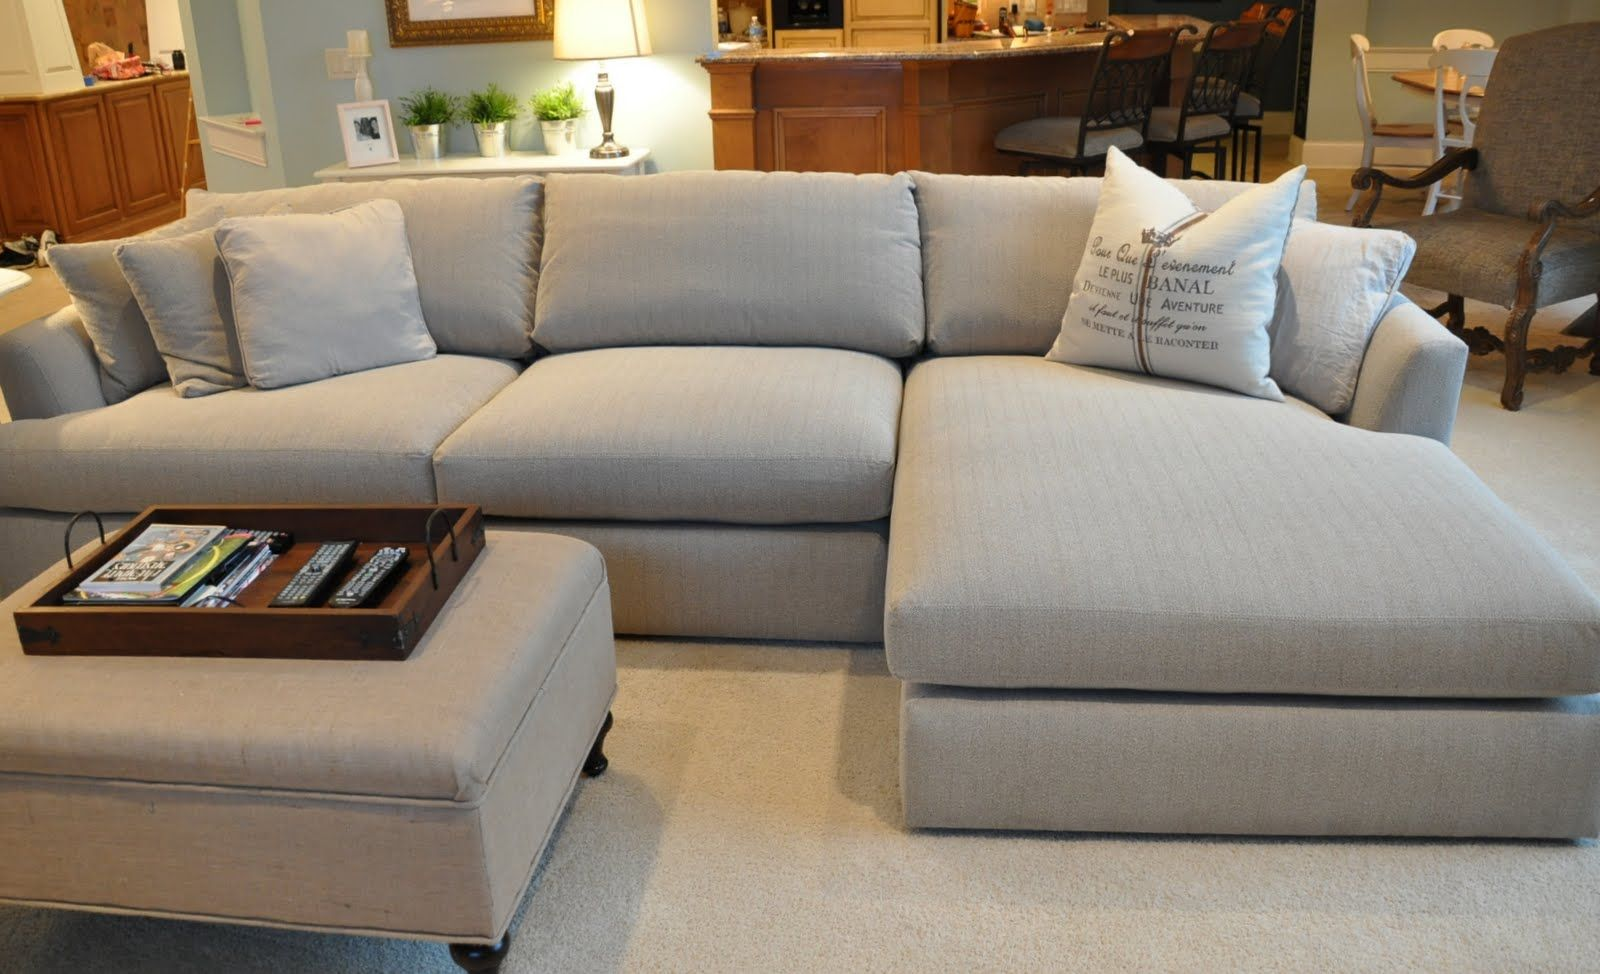 Bon Nice Deep Sofa With Chaise , Luxury Deep Sofa With Chaise 30 With  Additional Contemporary Sofa Inspiration With Deep Sofa With Chaise ...